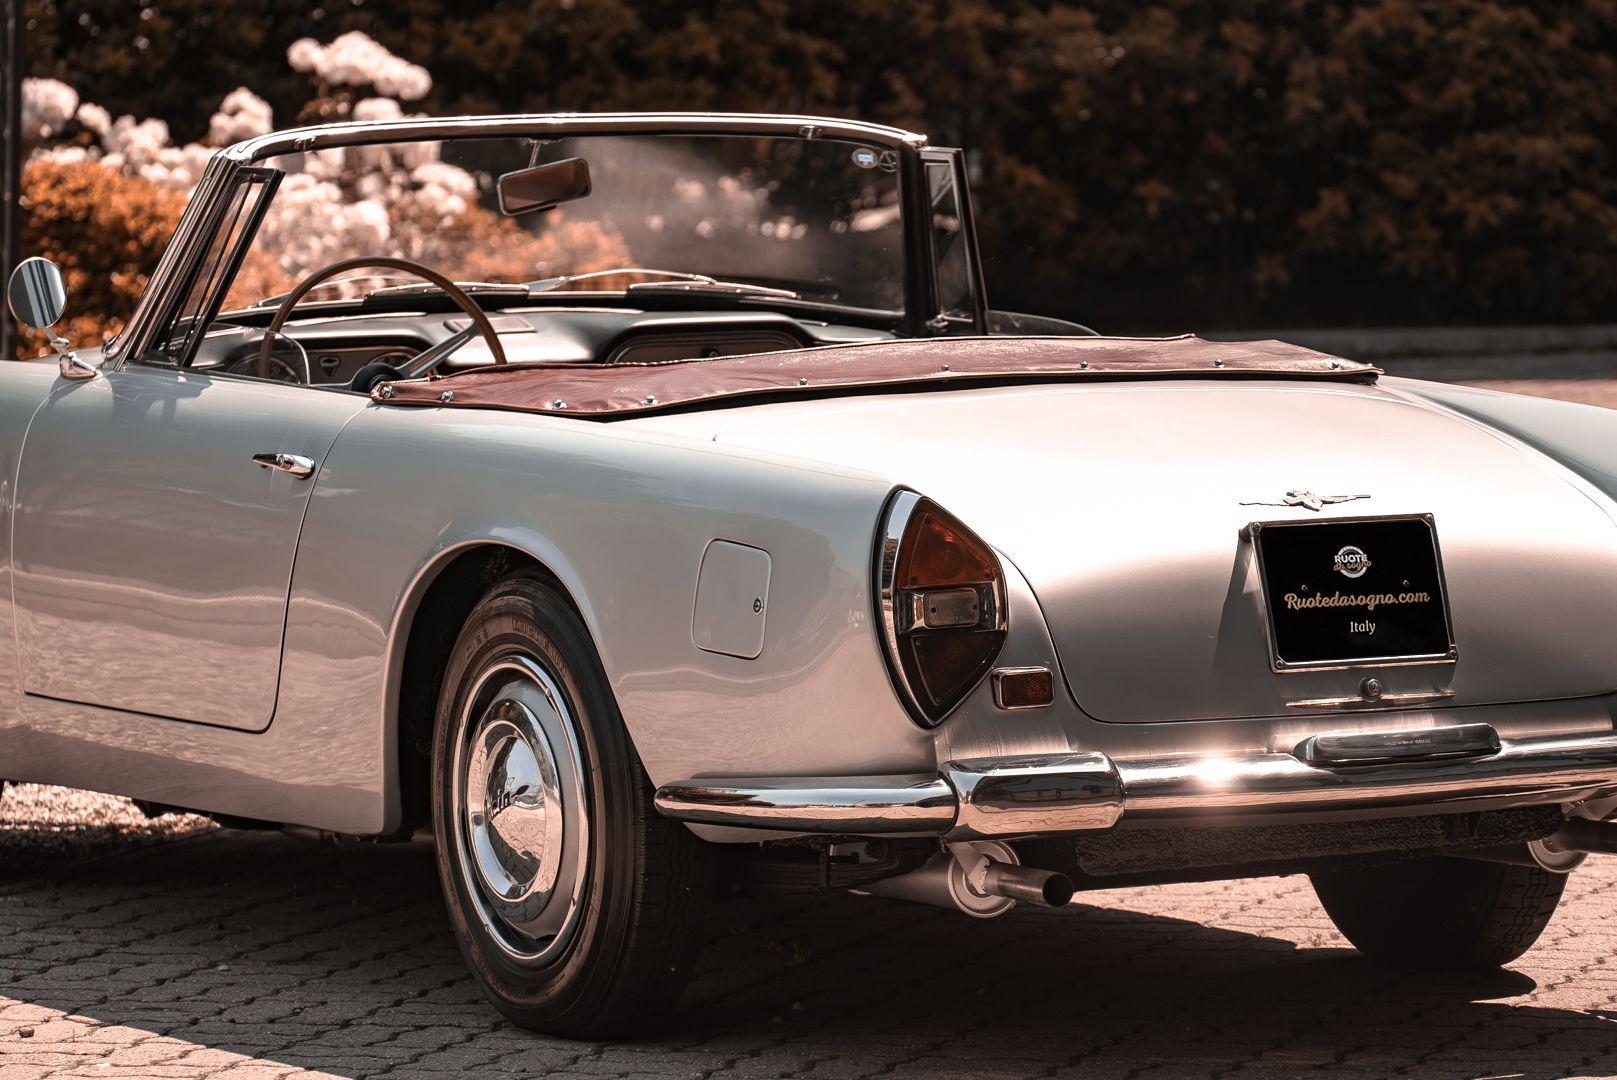 1963 Lancia Flaminia Touring Convertible 2500 3C  73147